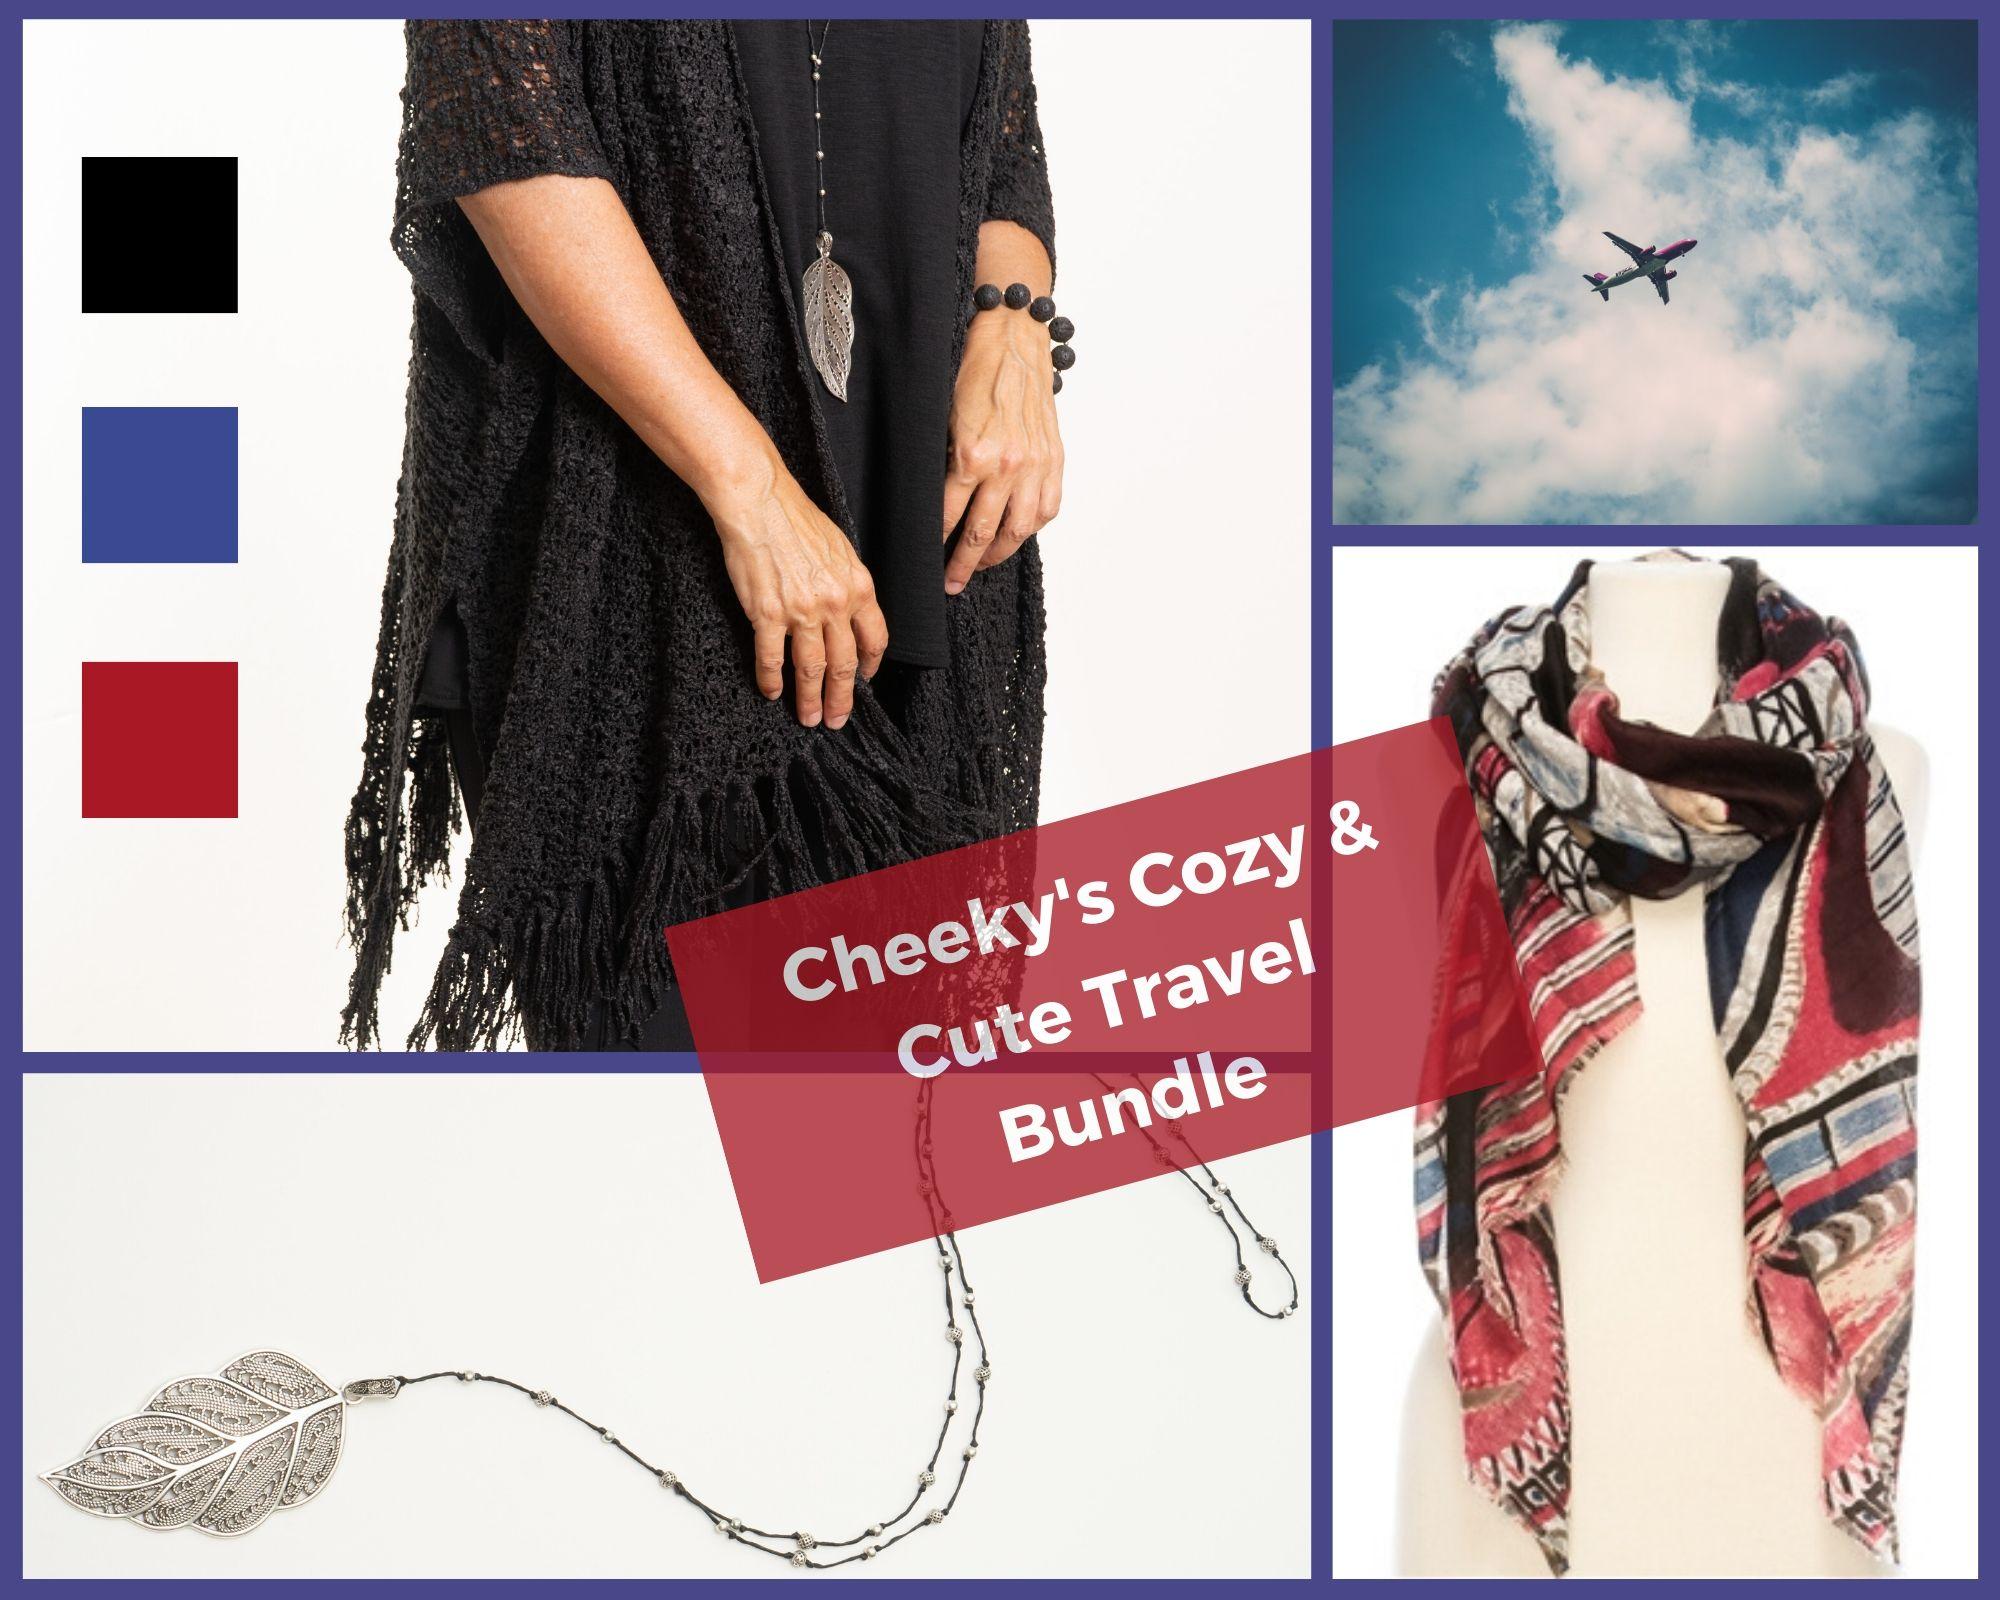 black-fringe-cozy-cute-travel-bundle-1-.jpg